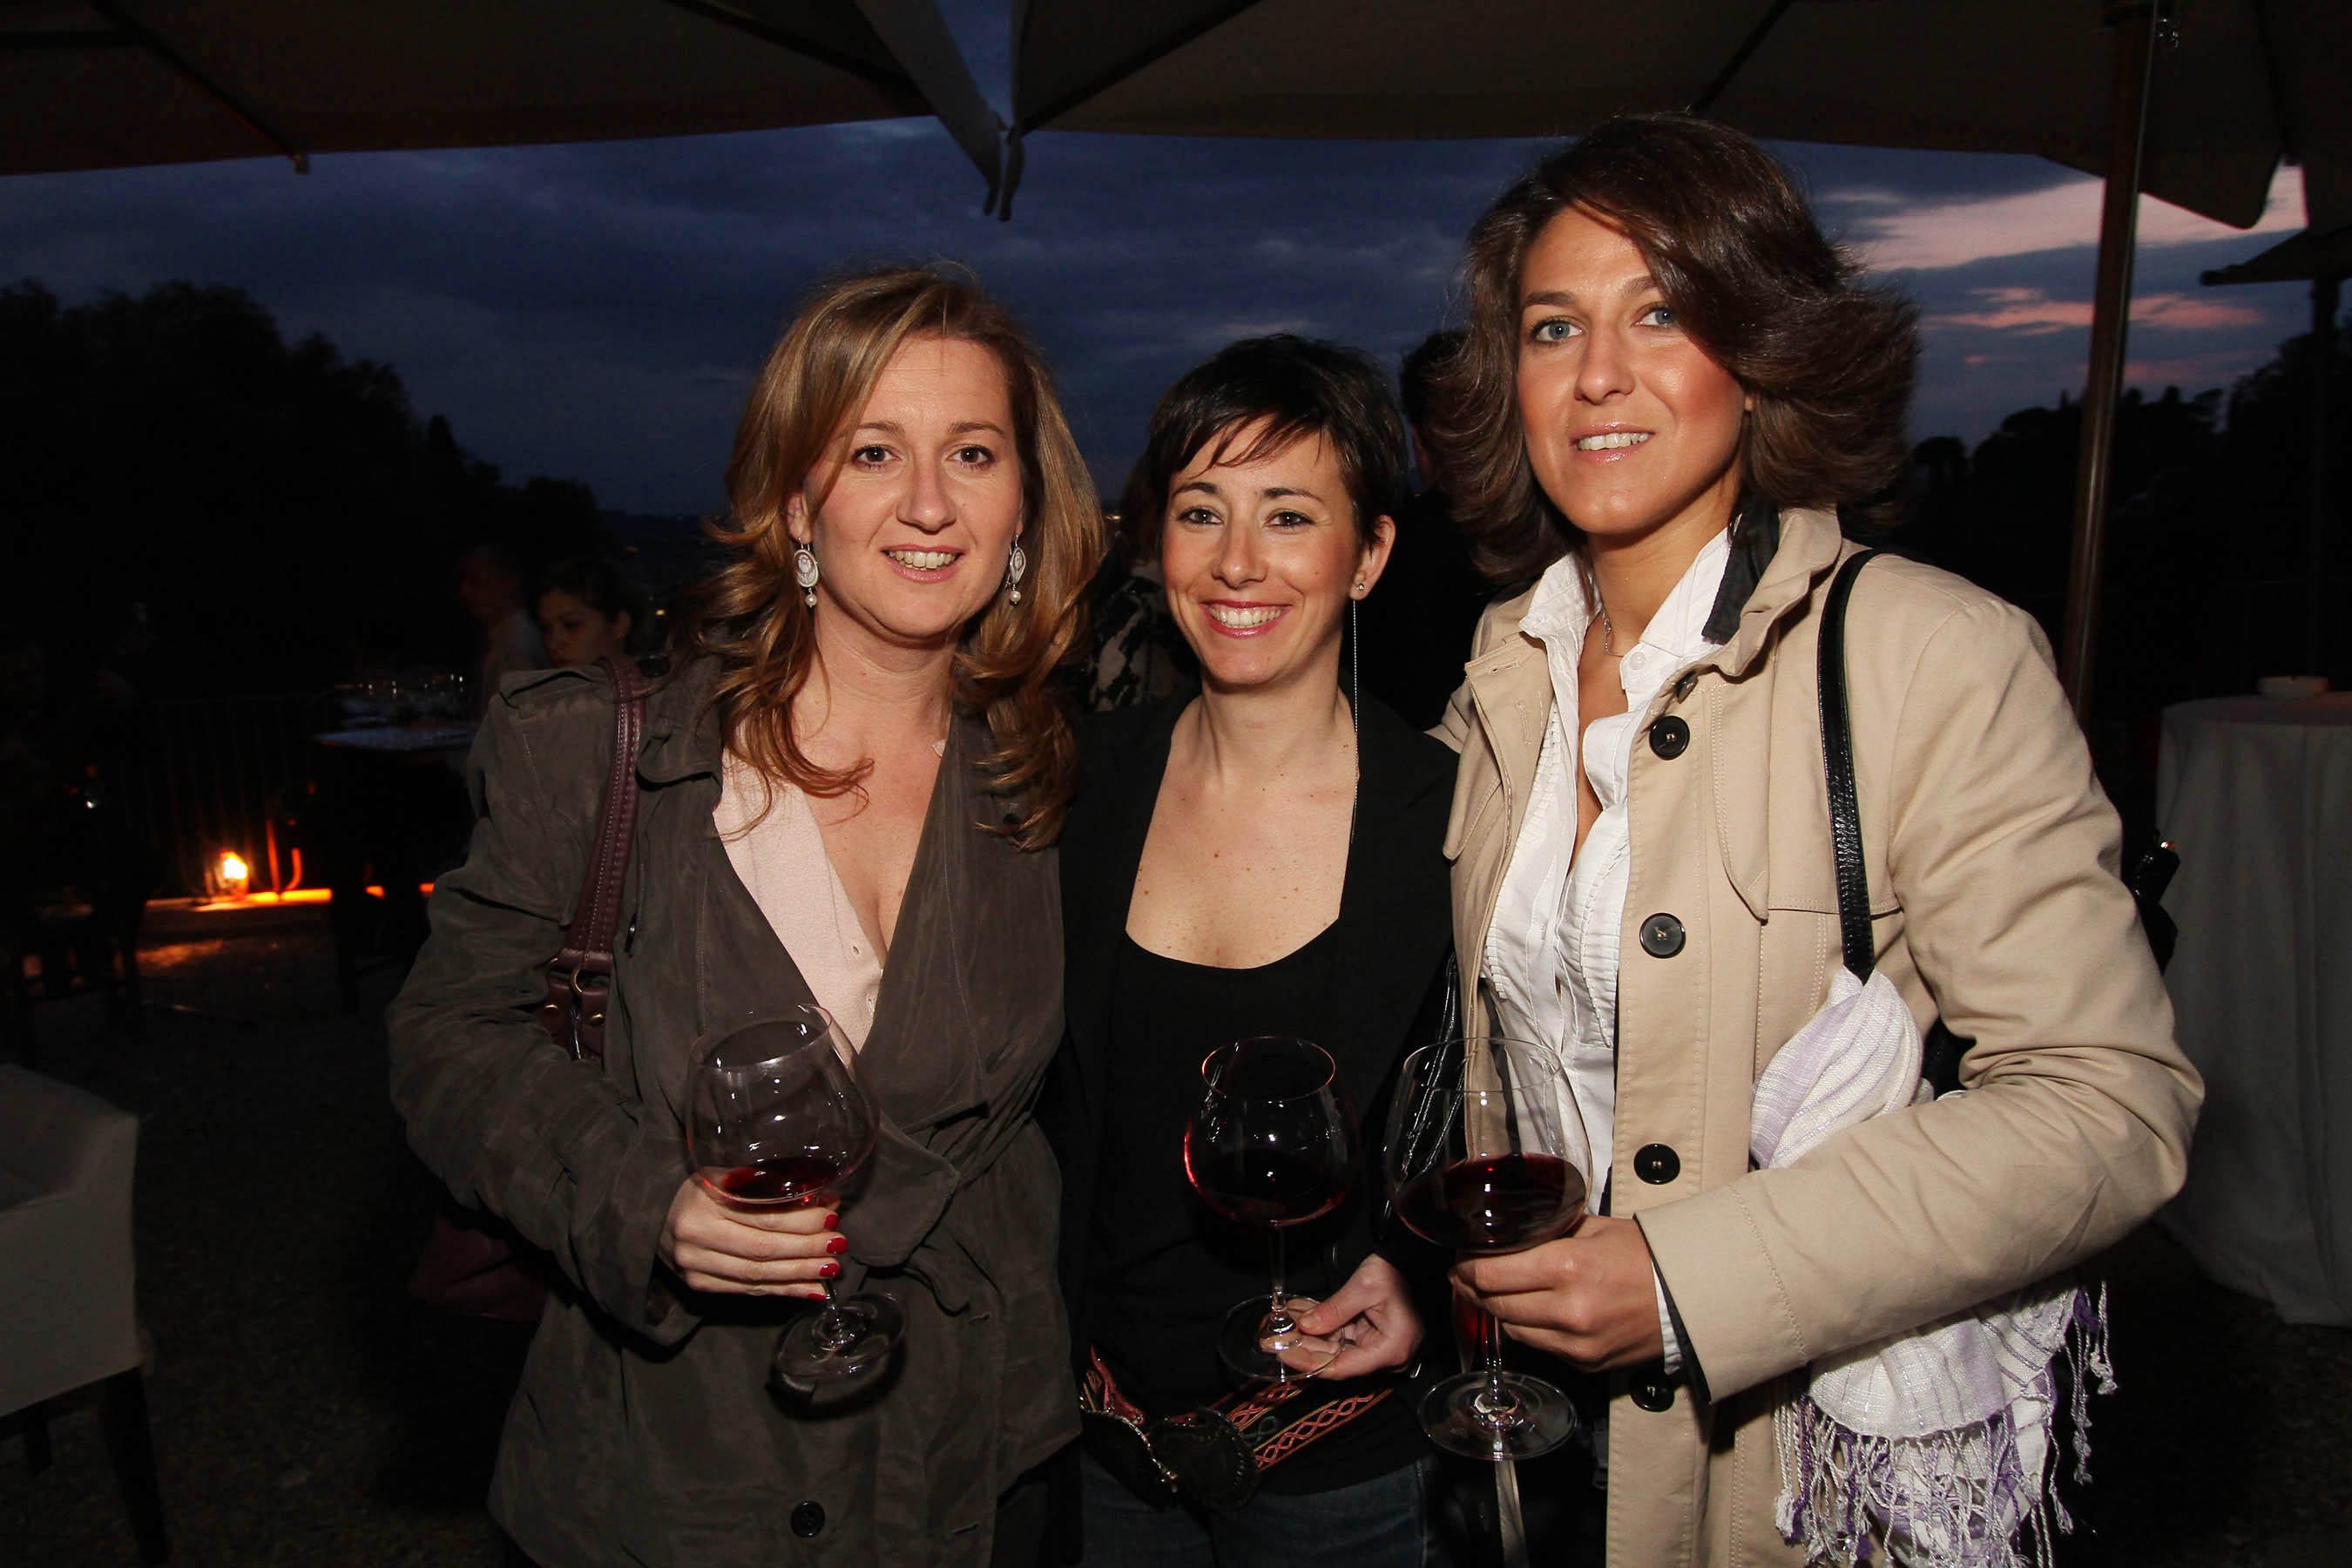 PRESSPHOTO Firenze, festa Firenze Magazine. Nella foto Lucrezia Abrami, Giulia Marcucci e Gemma Magrini